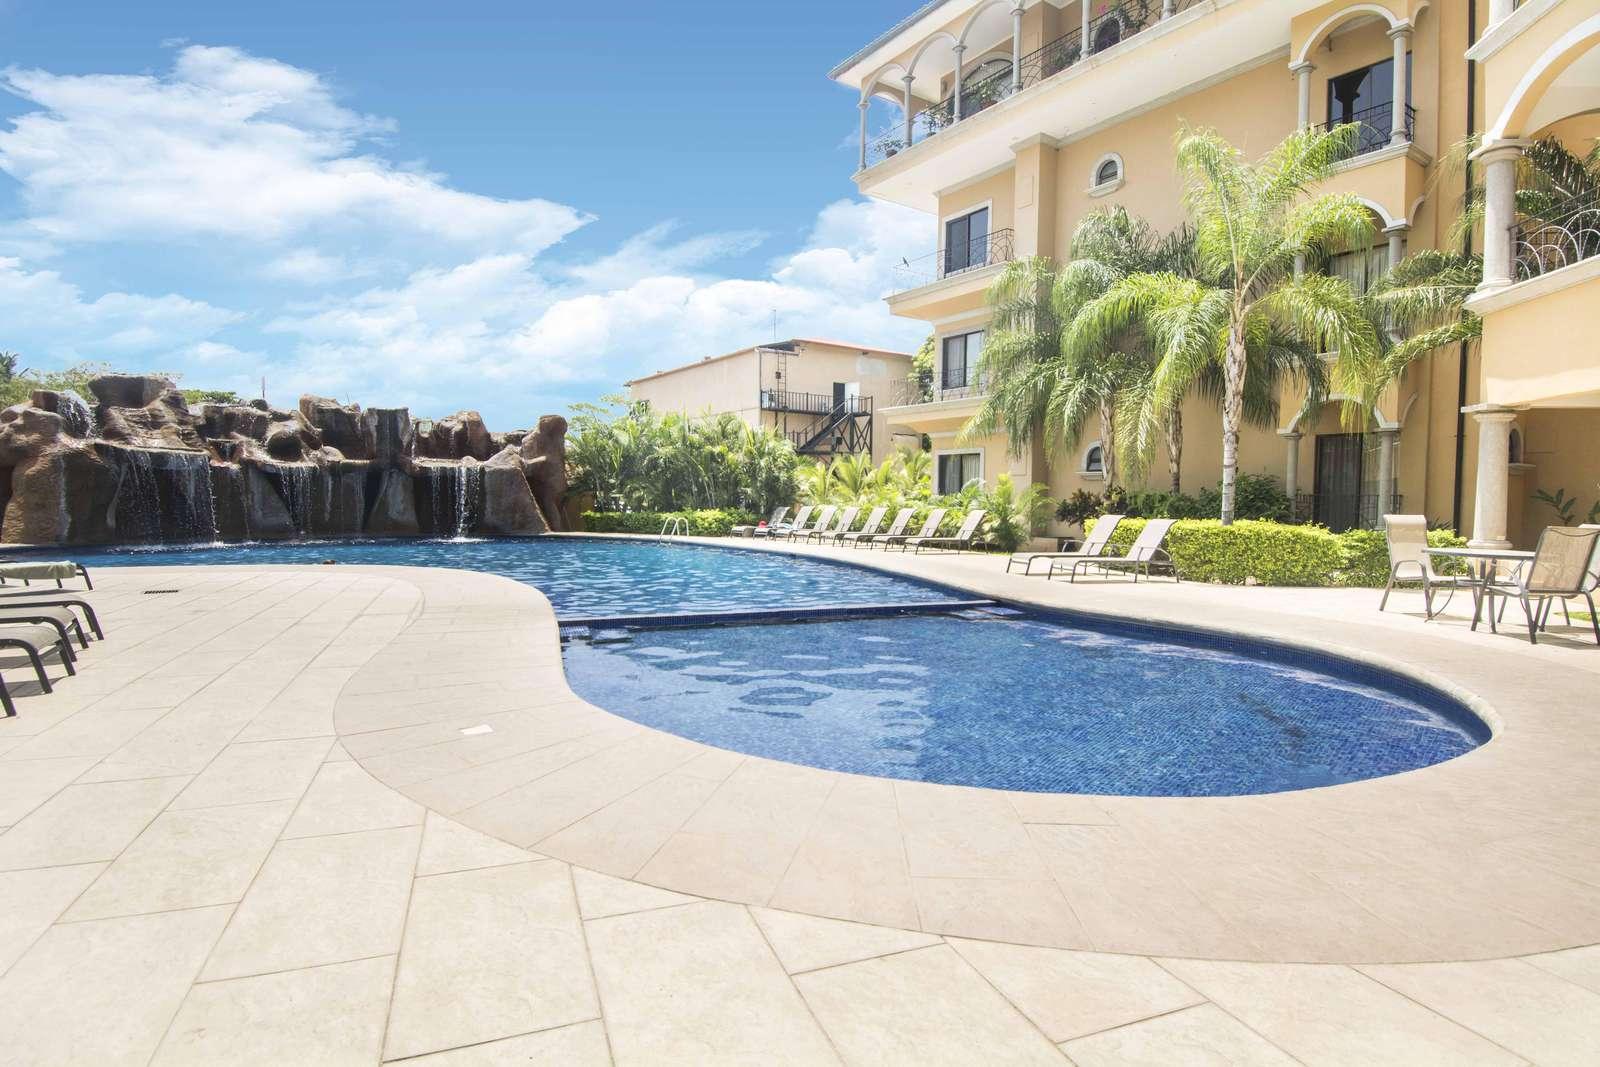 Large resort style pool